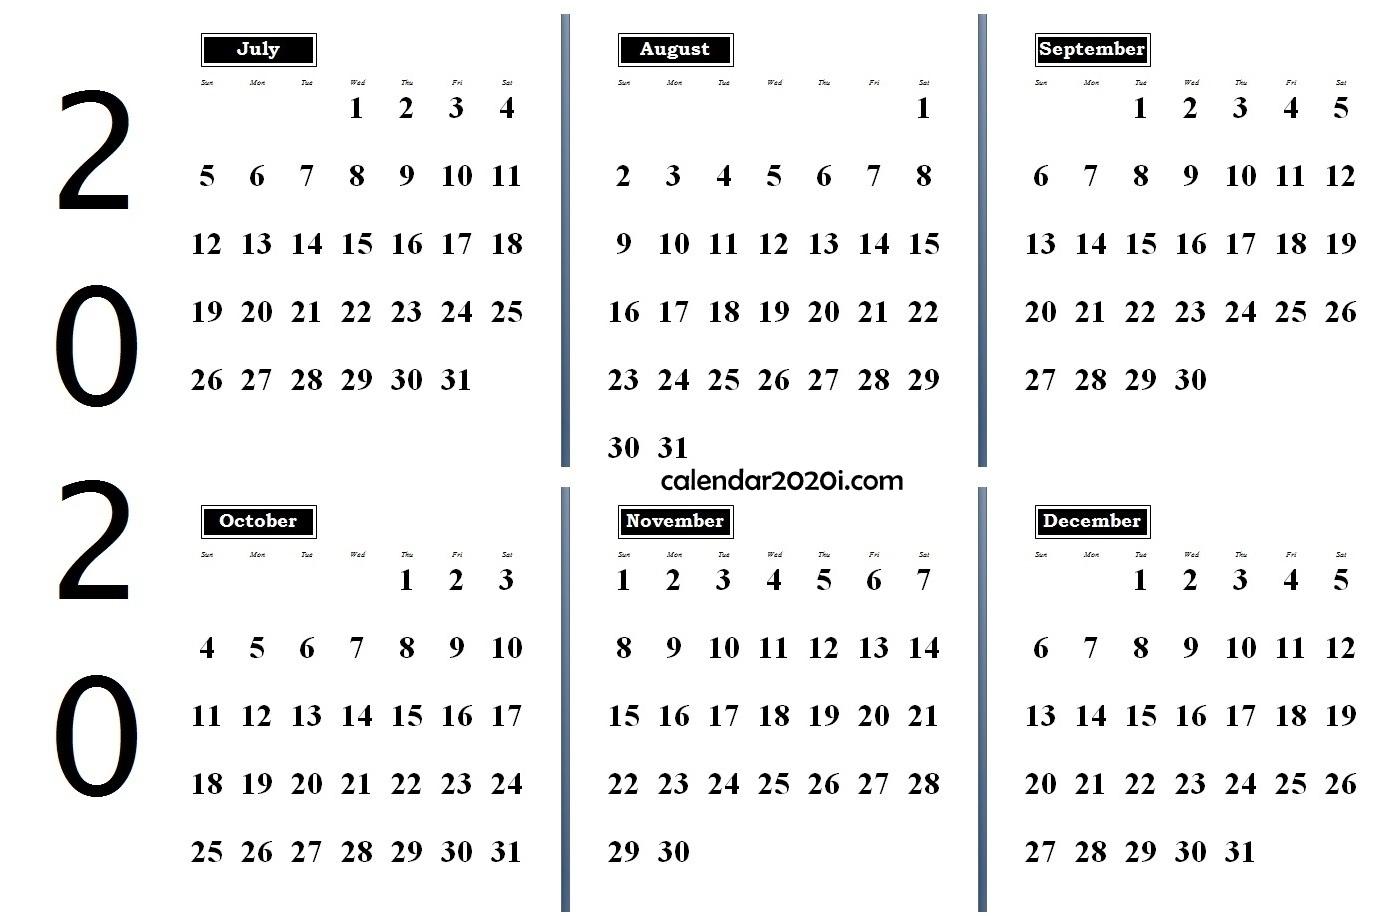 6 Months 2020 Half Year Printable Calendar   Calendar 2020 Perky 6 M Onth Calendar On One Page